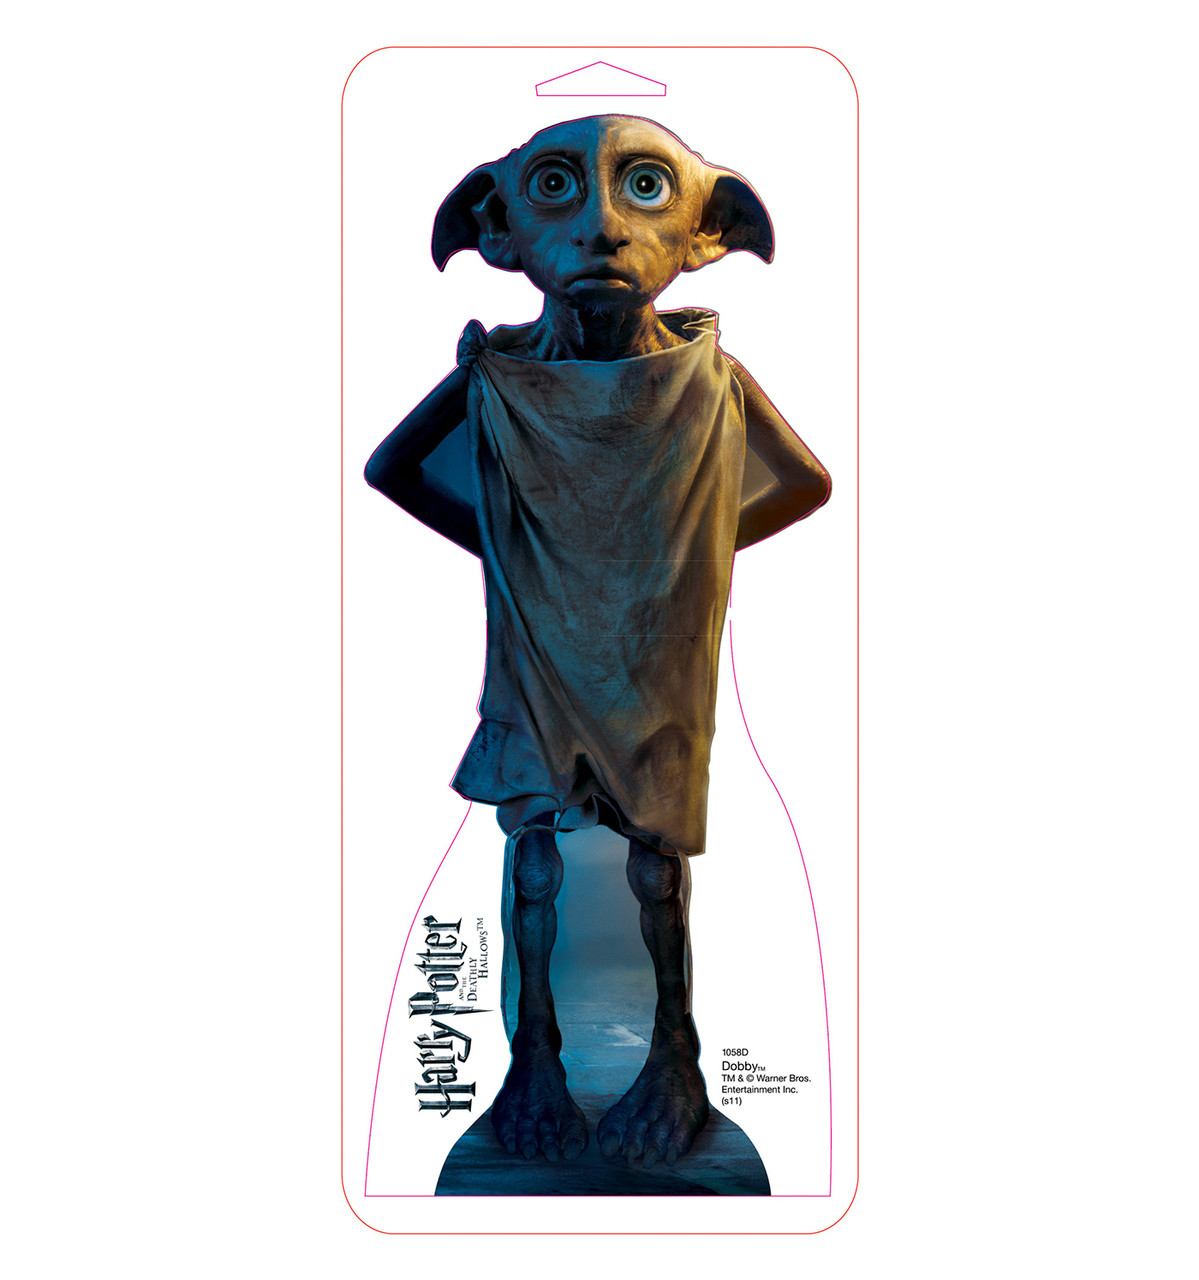 Tabletop Dobby - Mini Cardboard Standup